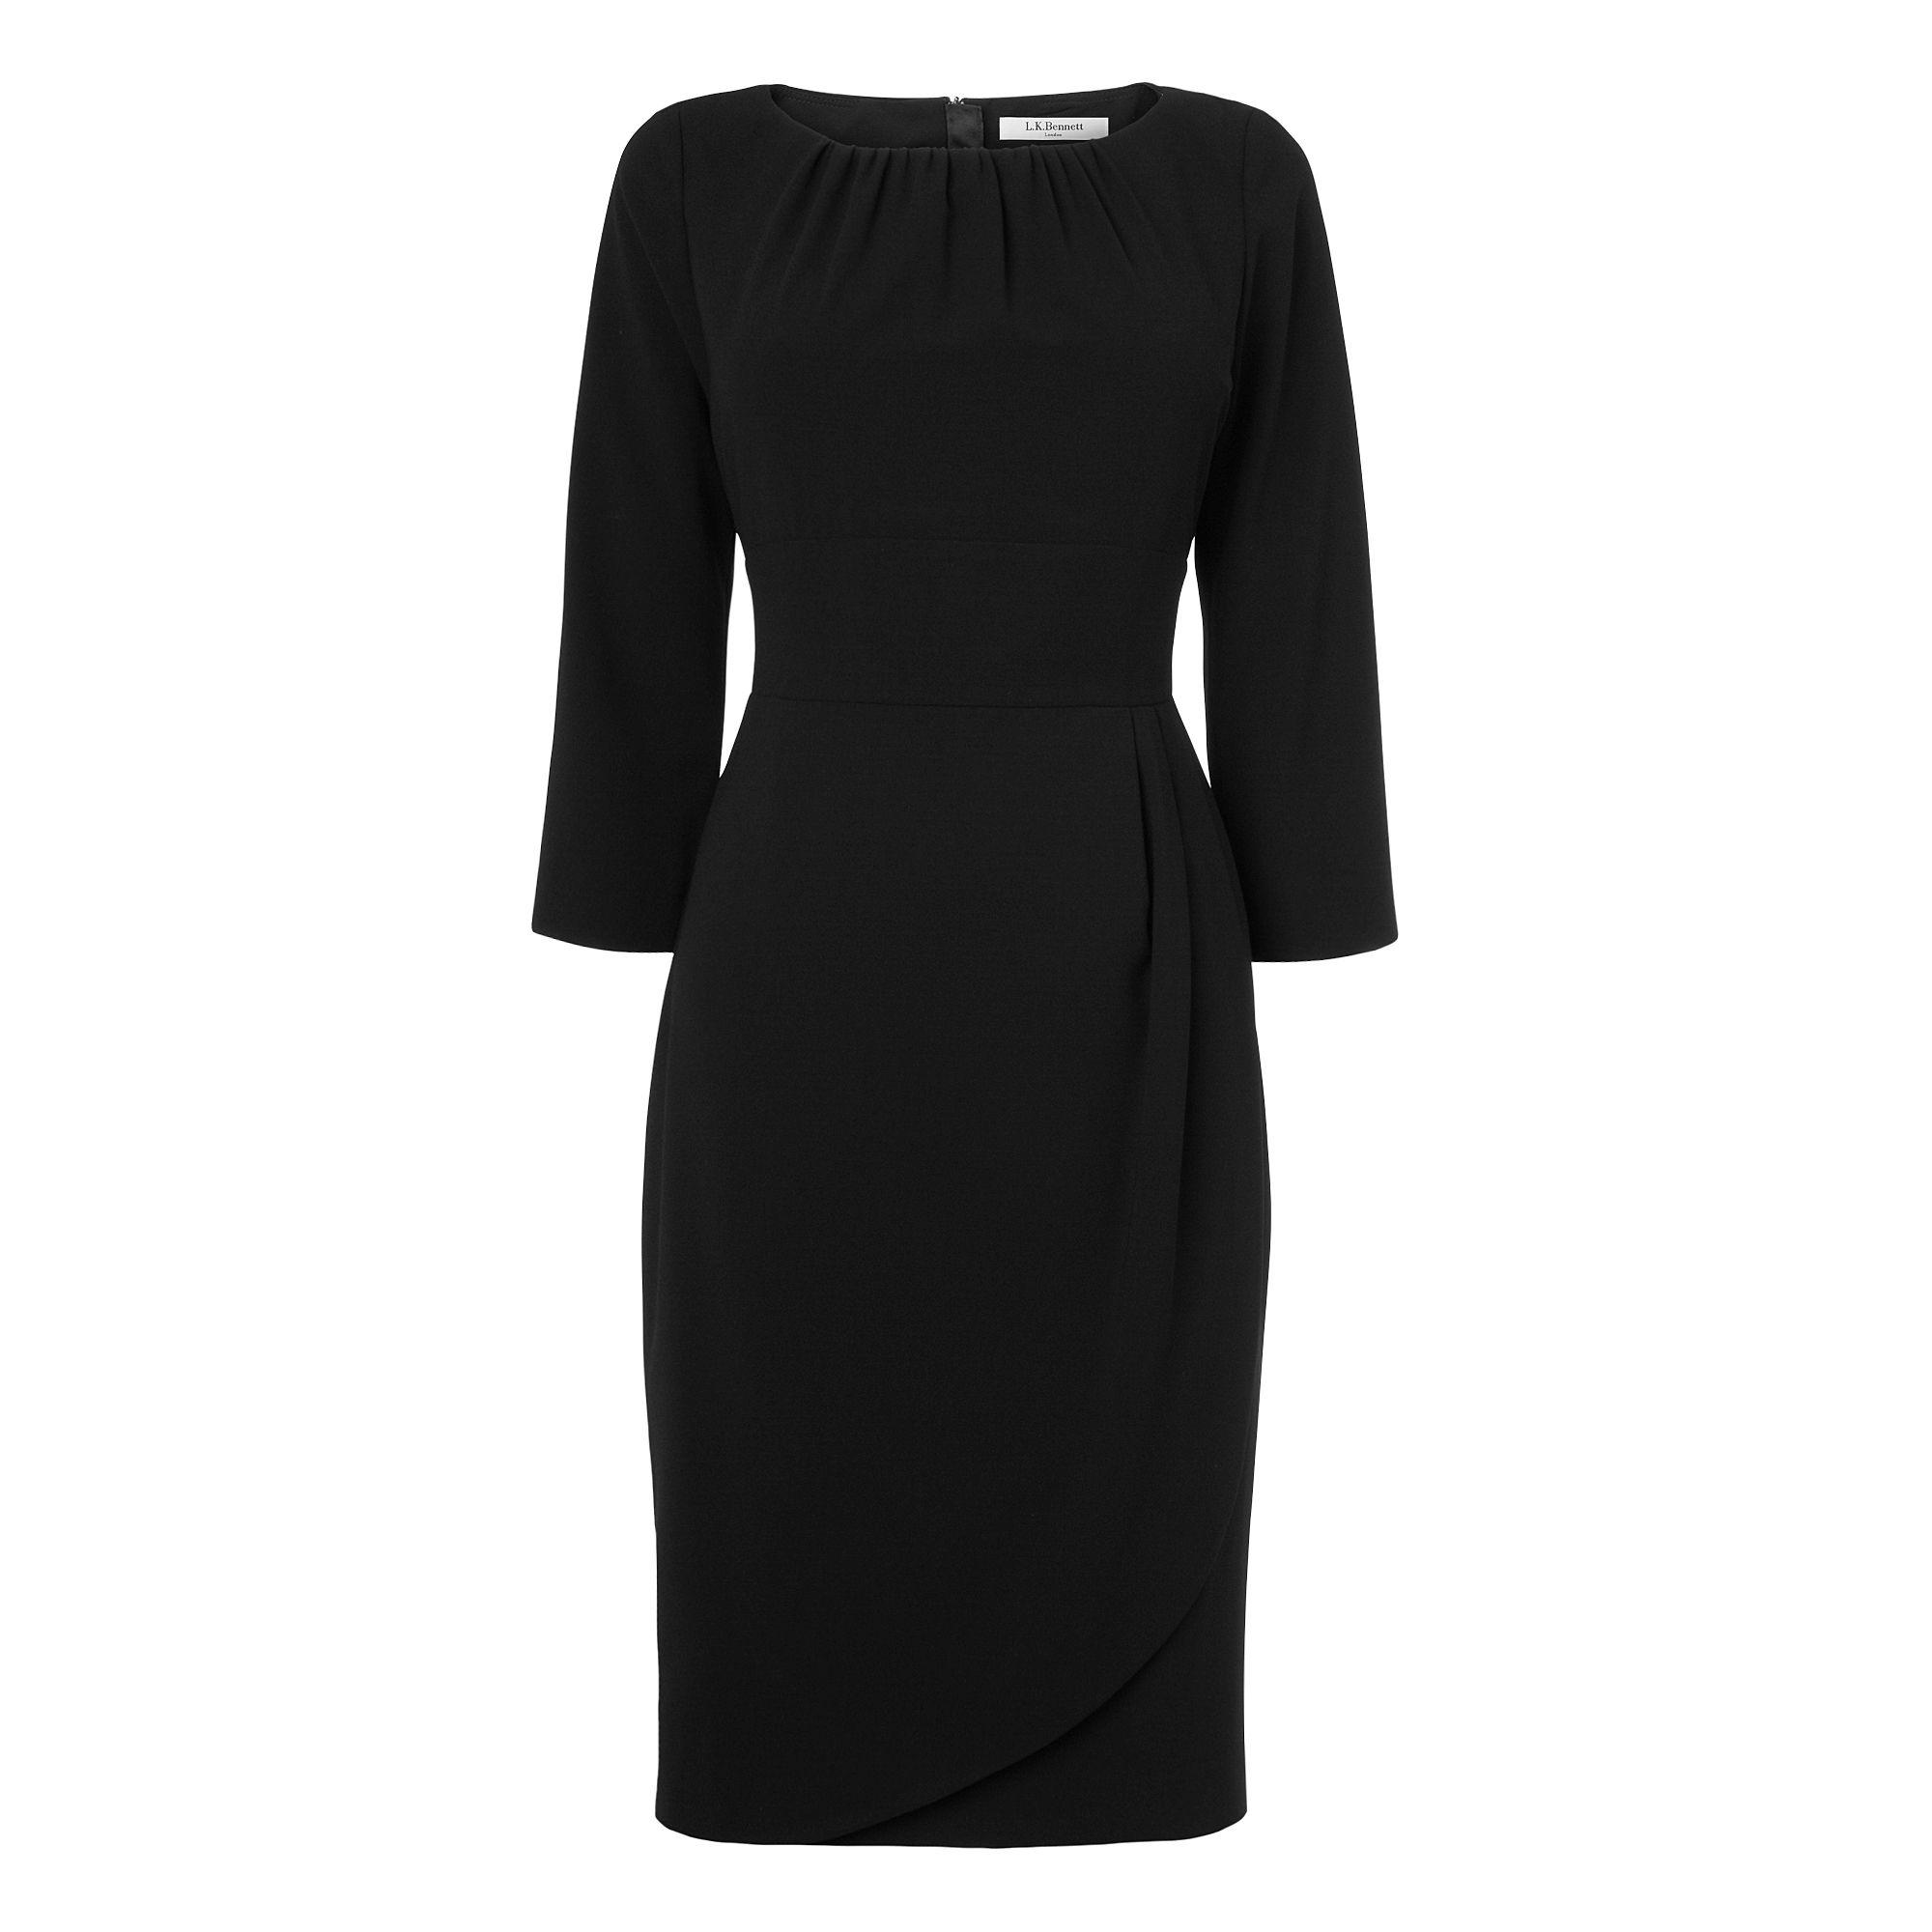 lk bennett in Diverse Women's Clothing | eBay